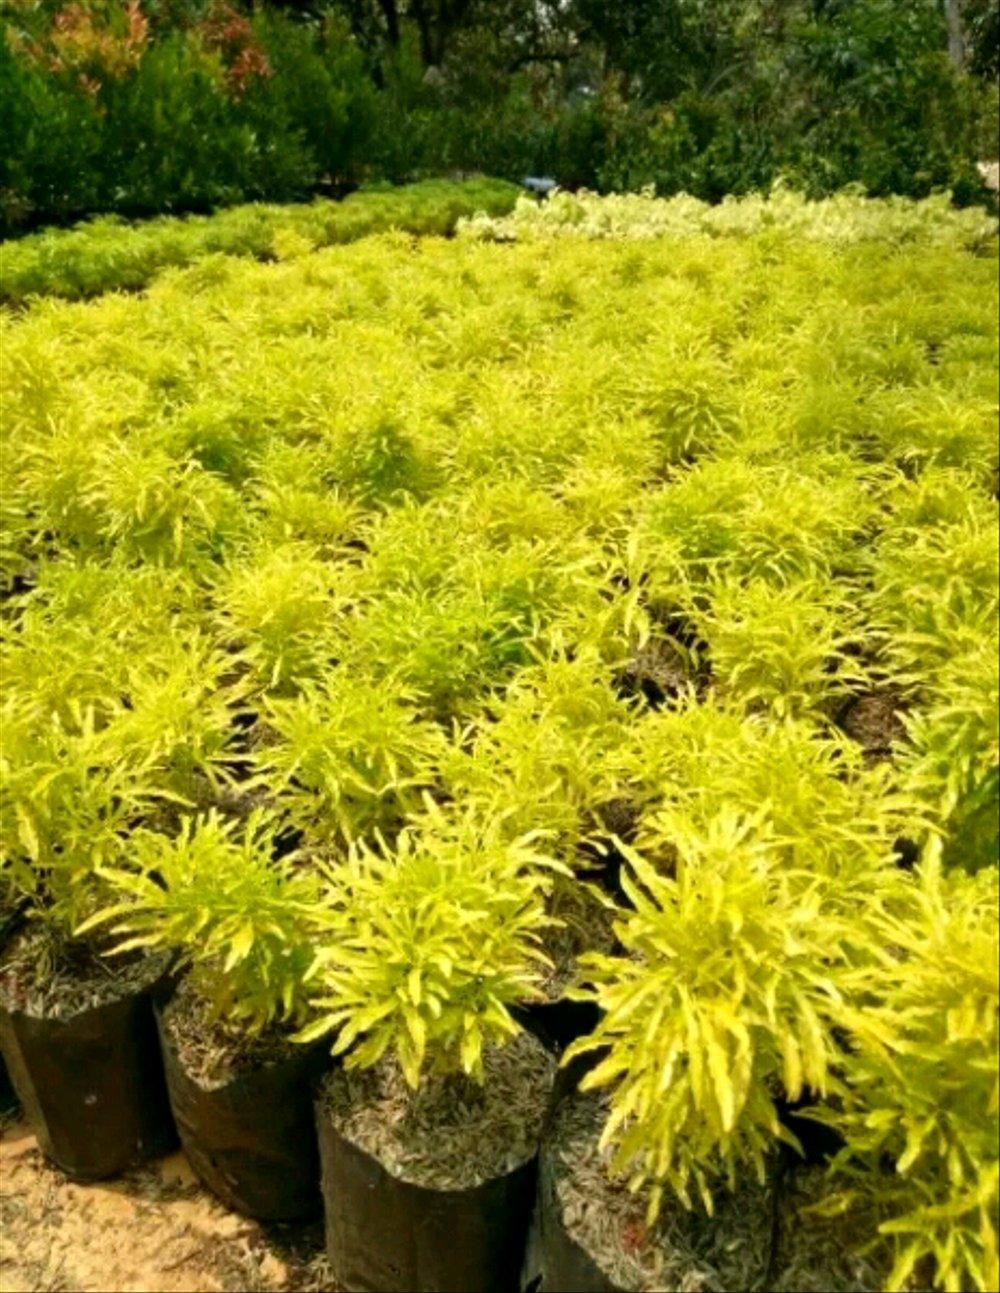 Tanaman Hias Brokoli Kuning Rr Landscape Taman Lazada Indonesia